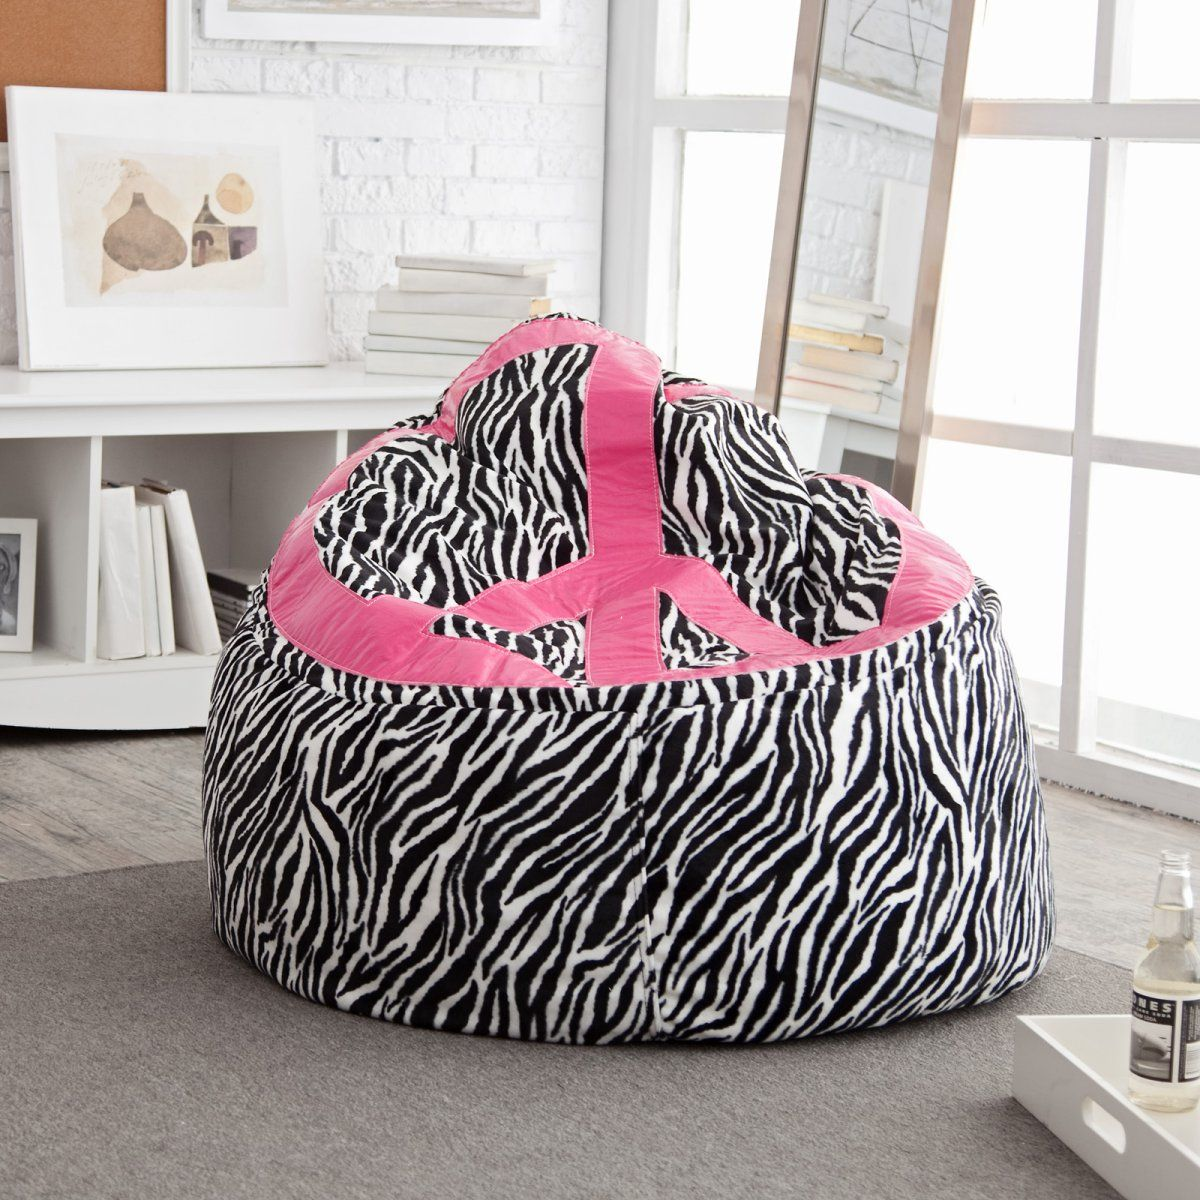 Zebra Print Bean Bag Chair Human Touch Massage Costco Peace Sign Tweens At Hayneedle